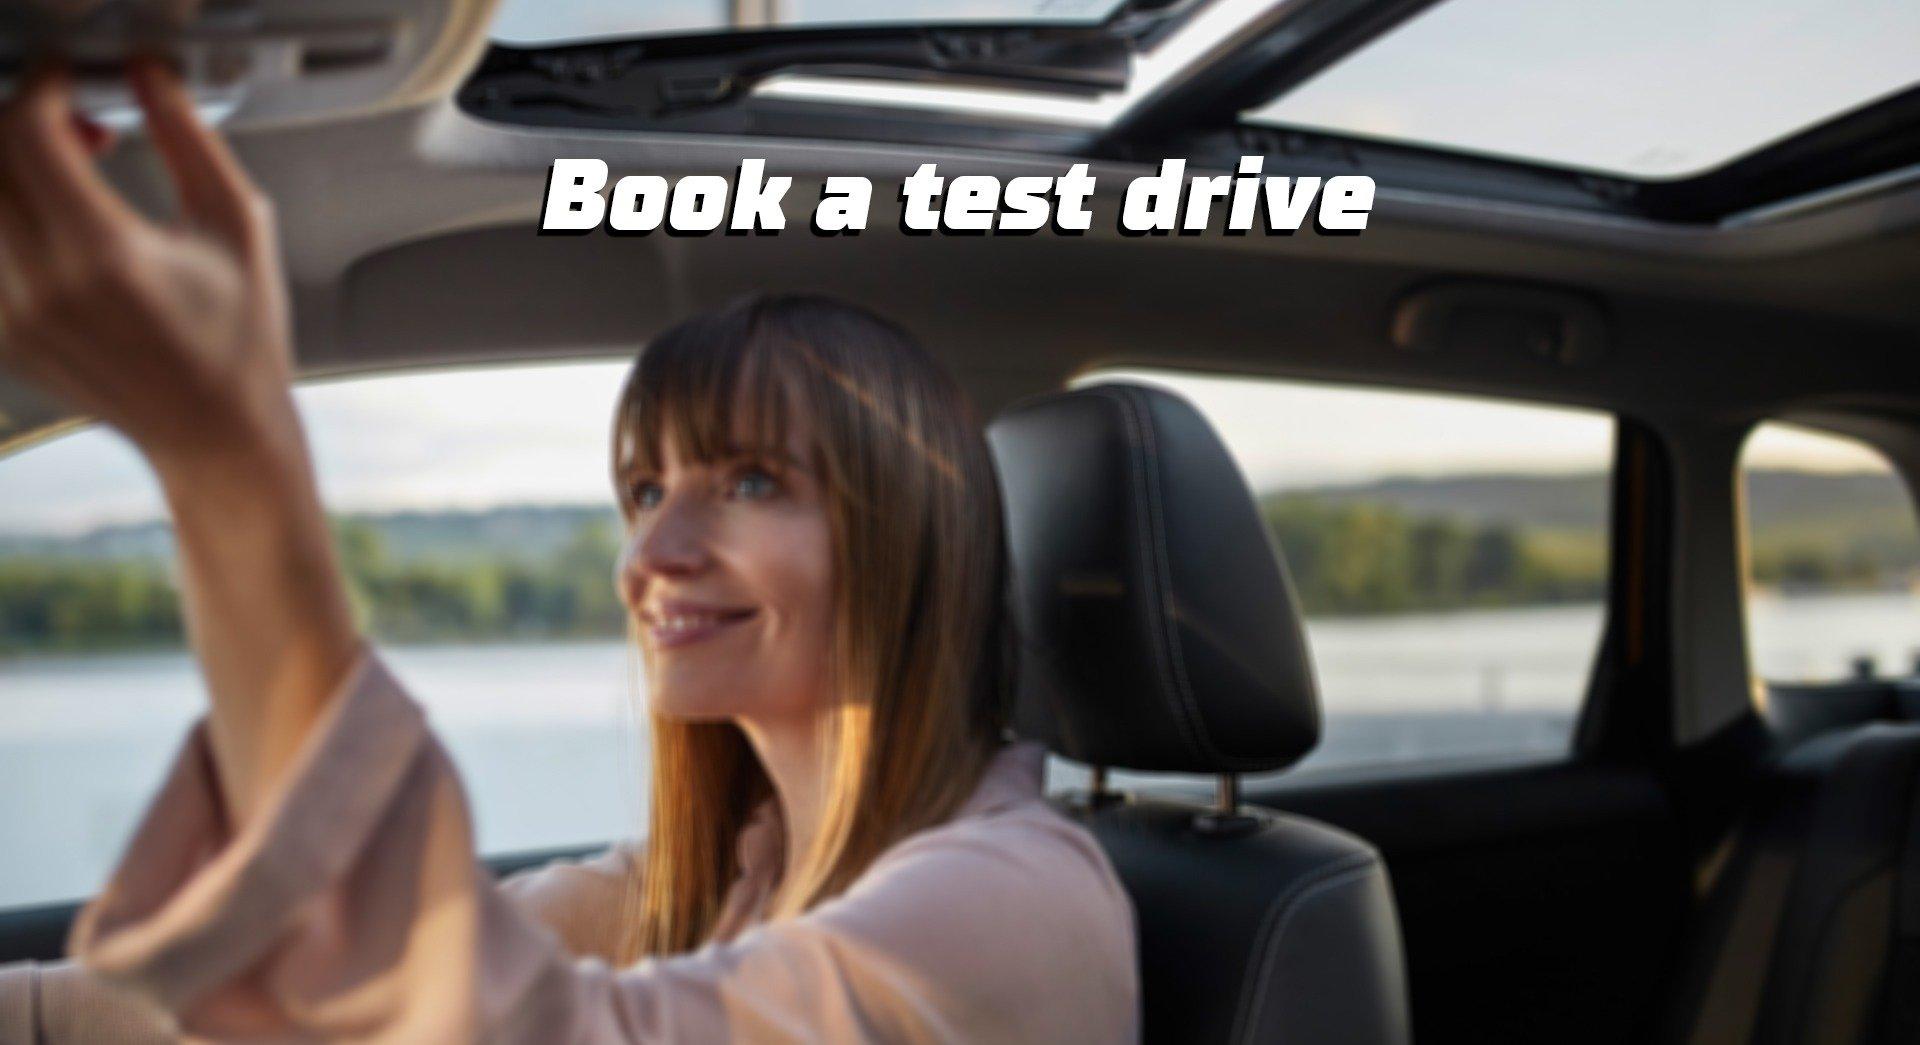 osborne-park-suzuki-book-a-test-drive